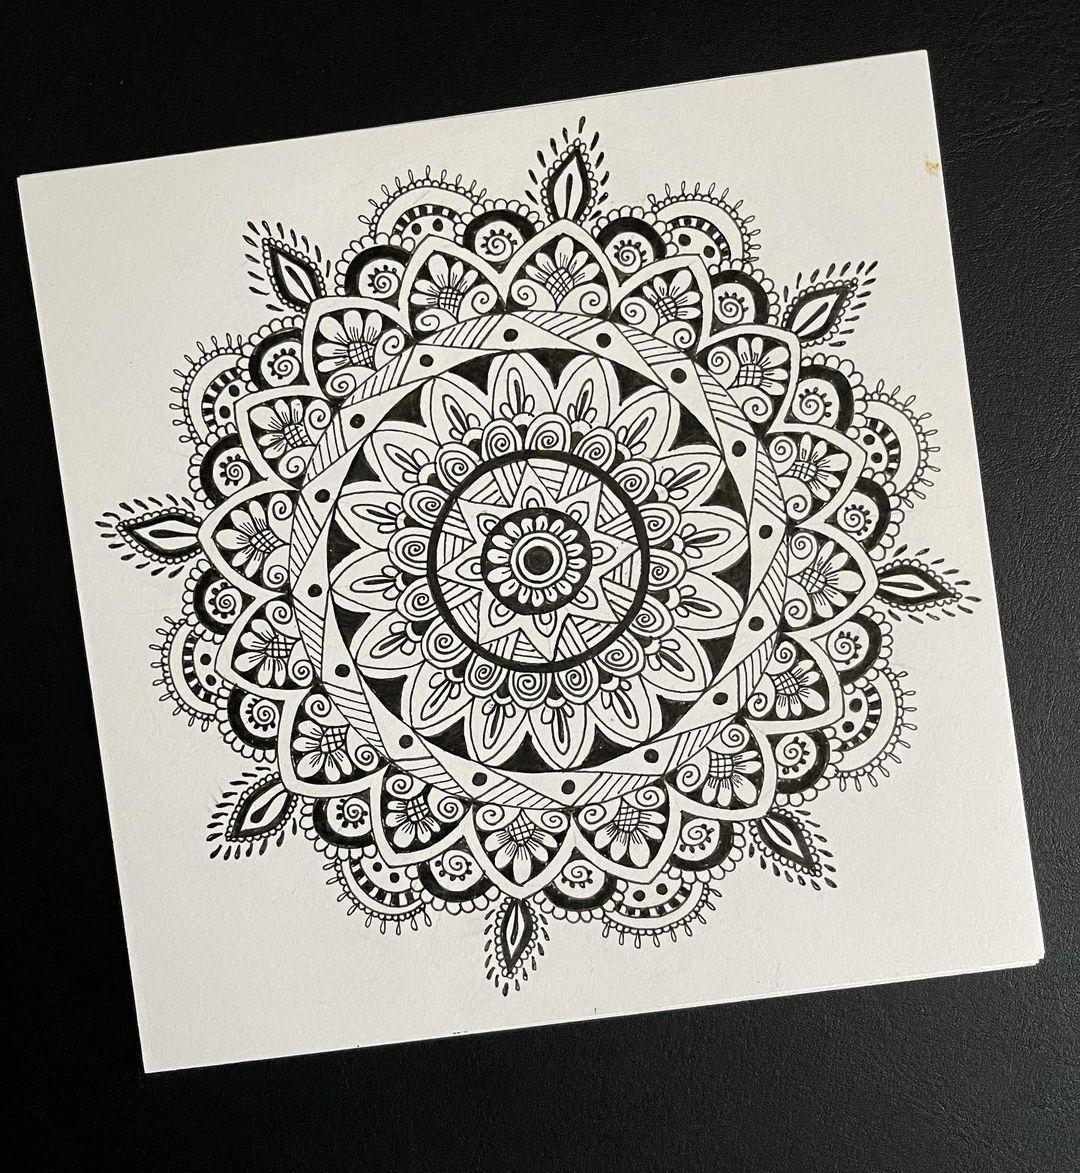 Anarghya On Instagram Mandala First Mandala Design I Tried It S So Calming Like Meditation Aa68 In 2021 Mandala Design Art Mandala Design Mandala Art Lesson